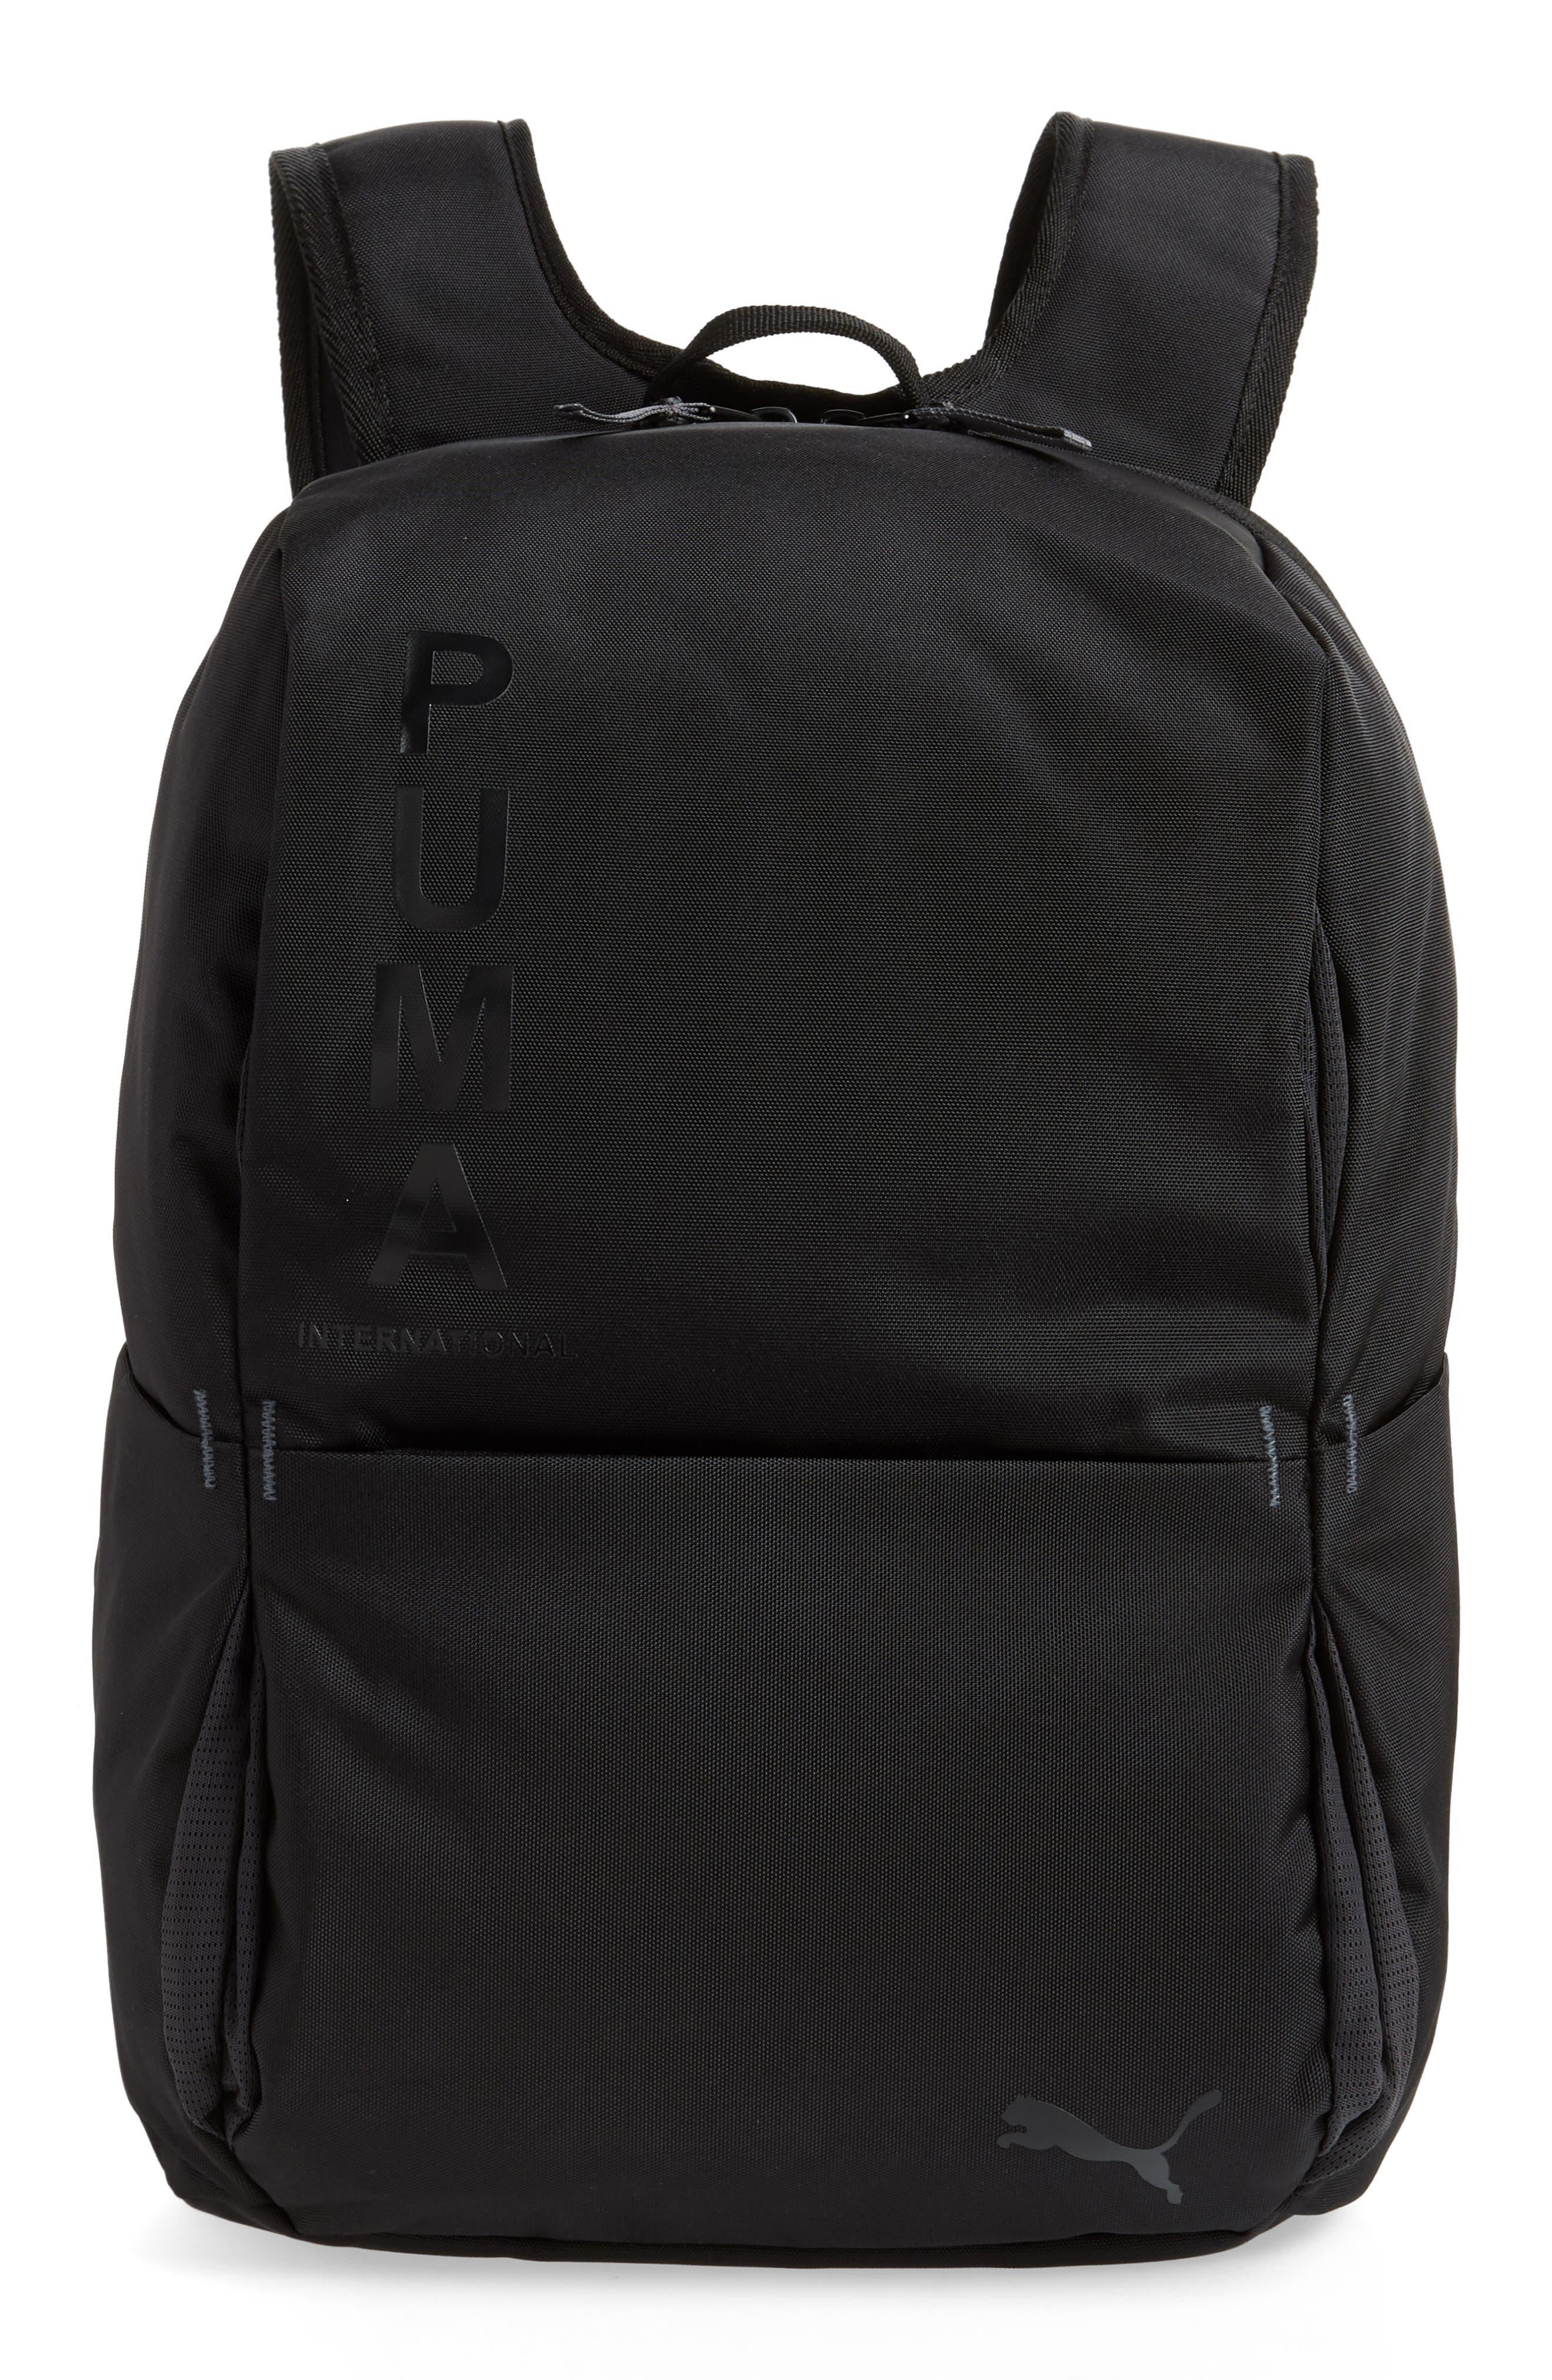 Ace Backpack,                         Main,                         color, BLACK